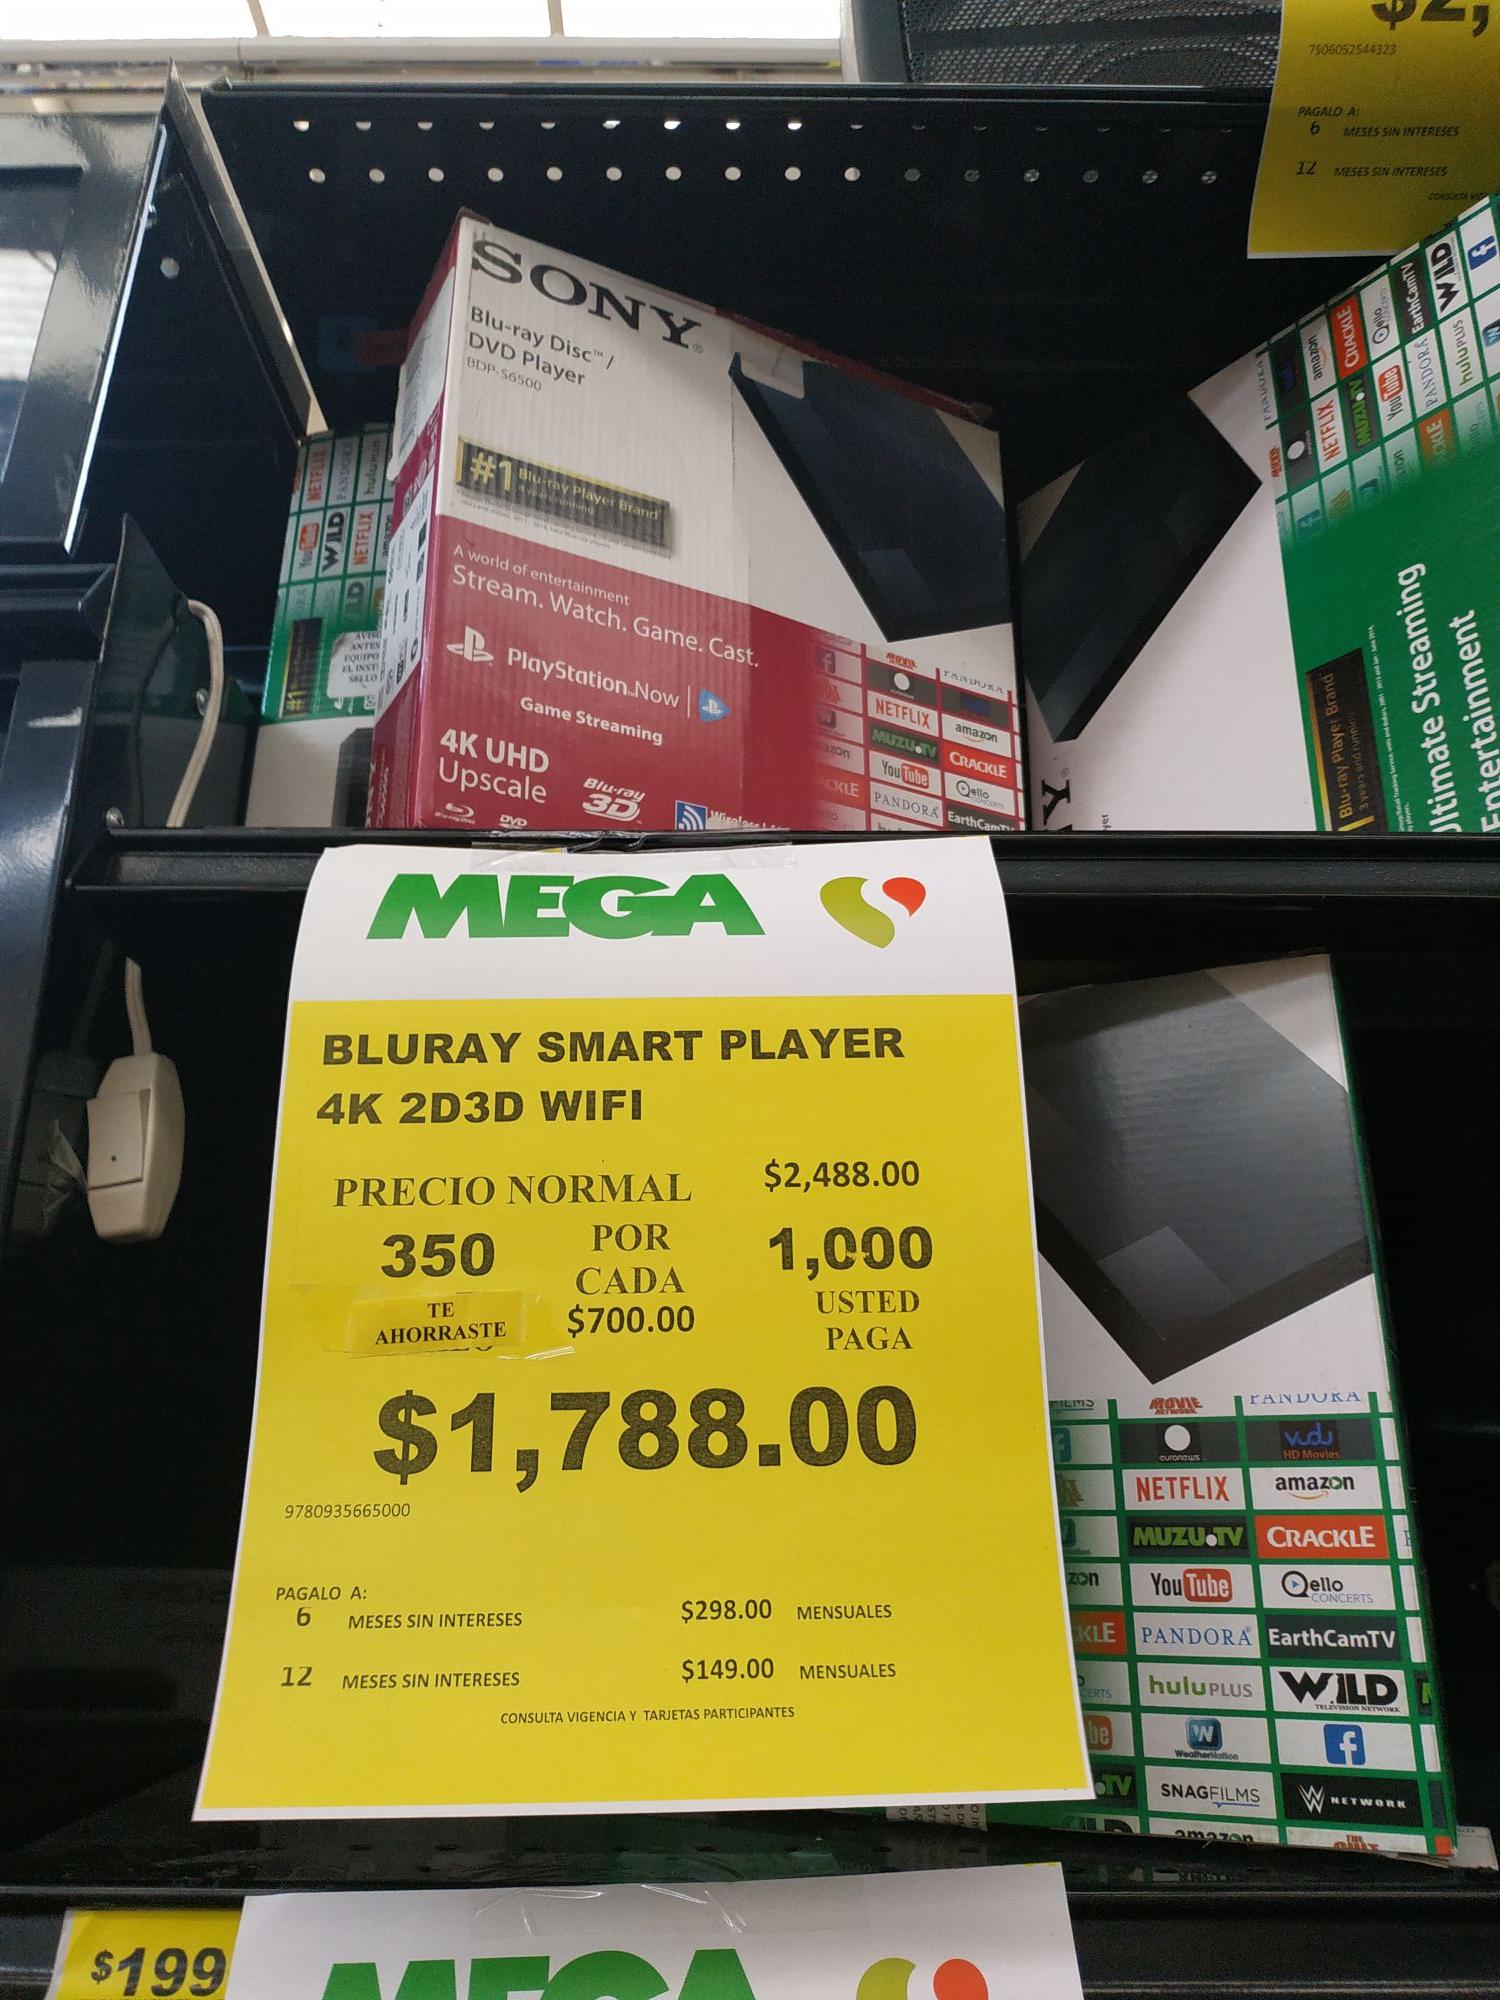 Mega Soriana. (OJO, REPRODUCE EN 4K) Reproductor de Blu Ray 4k Sony BDP S6500